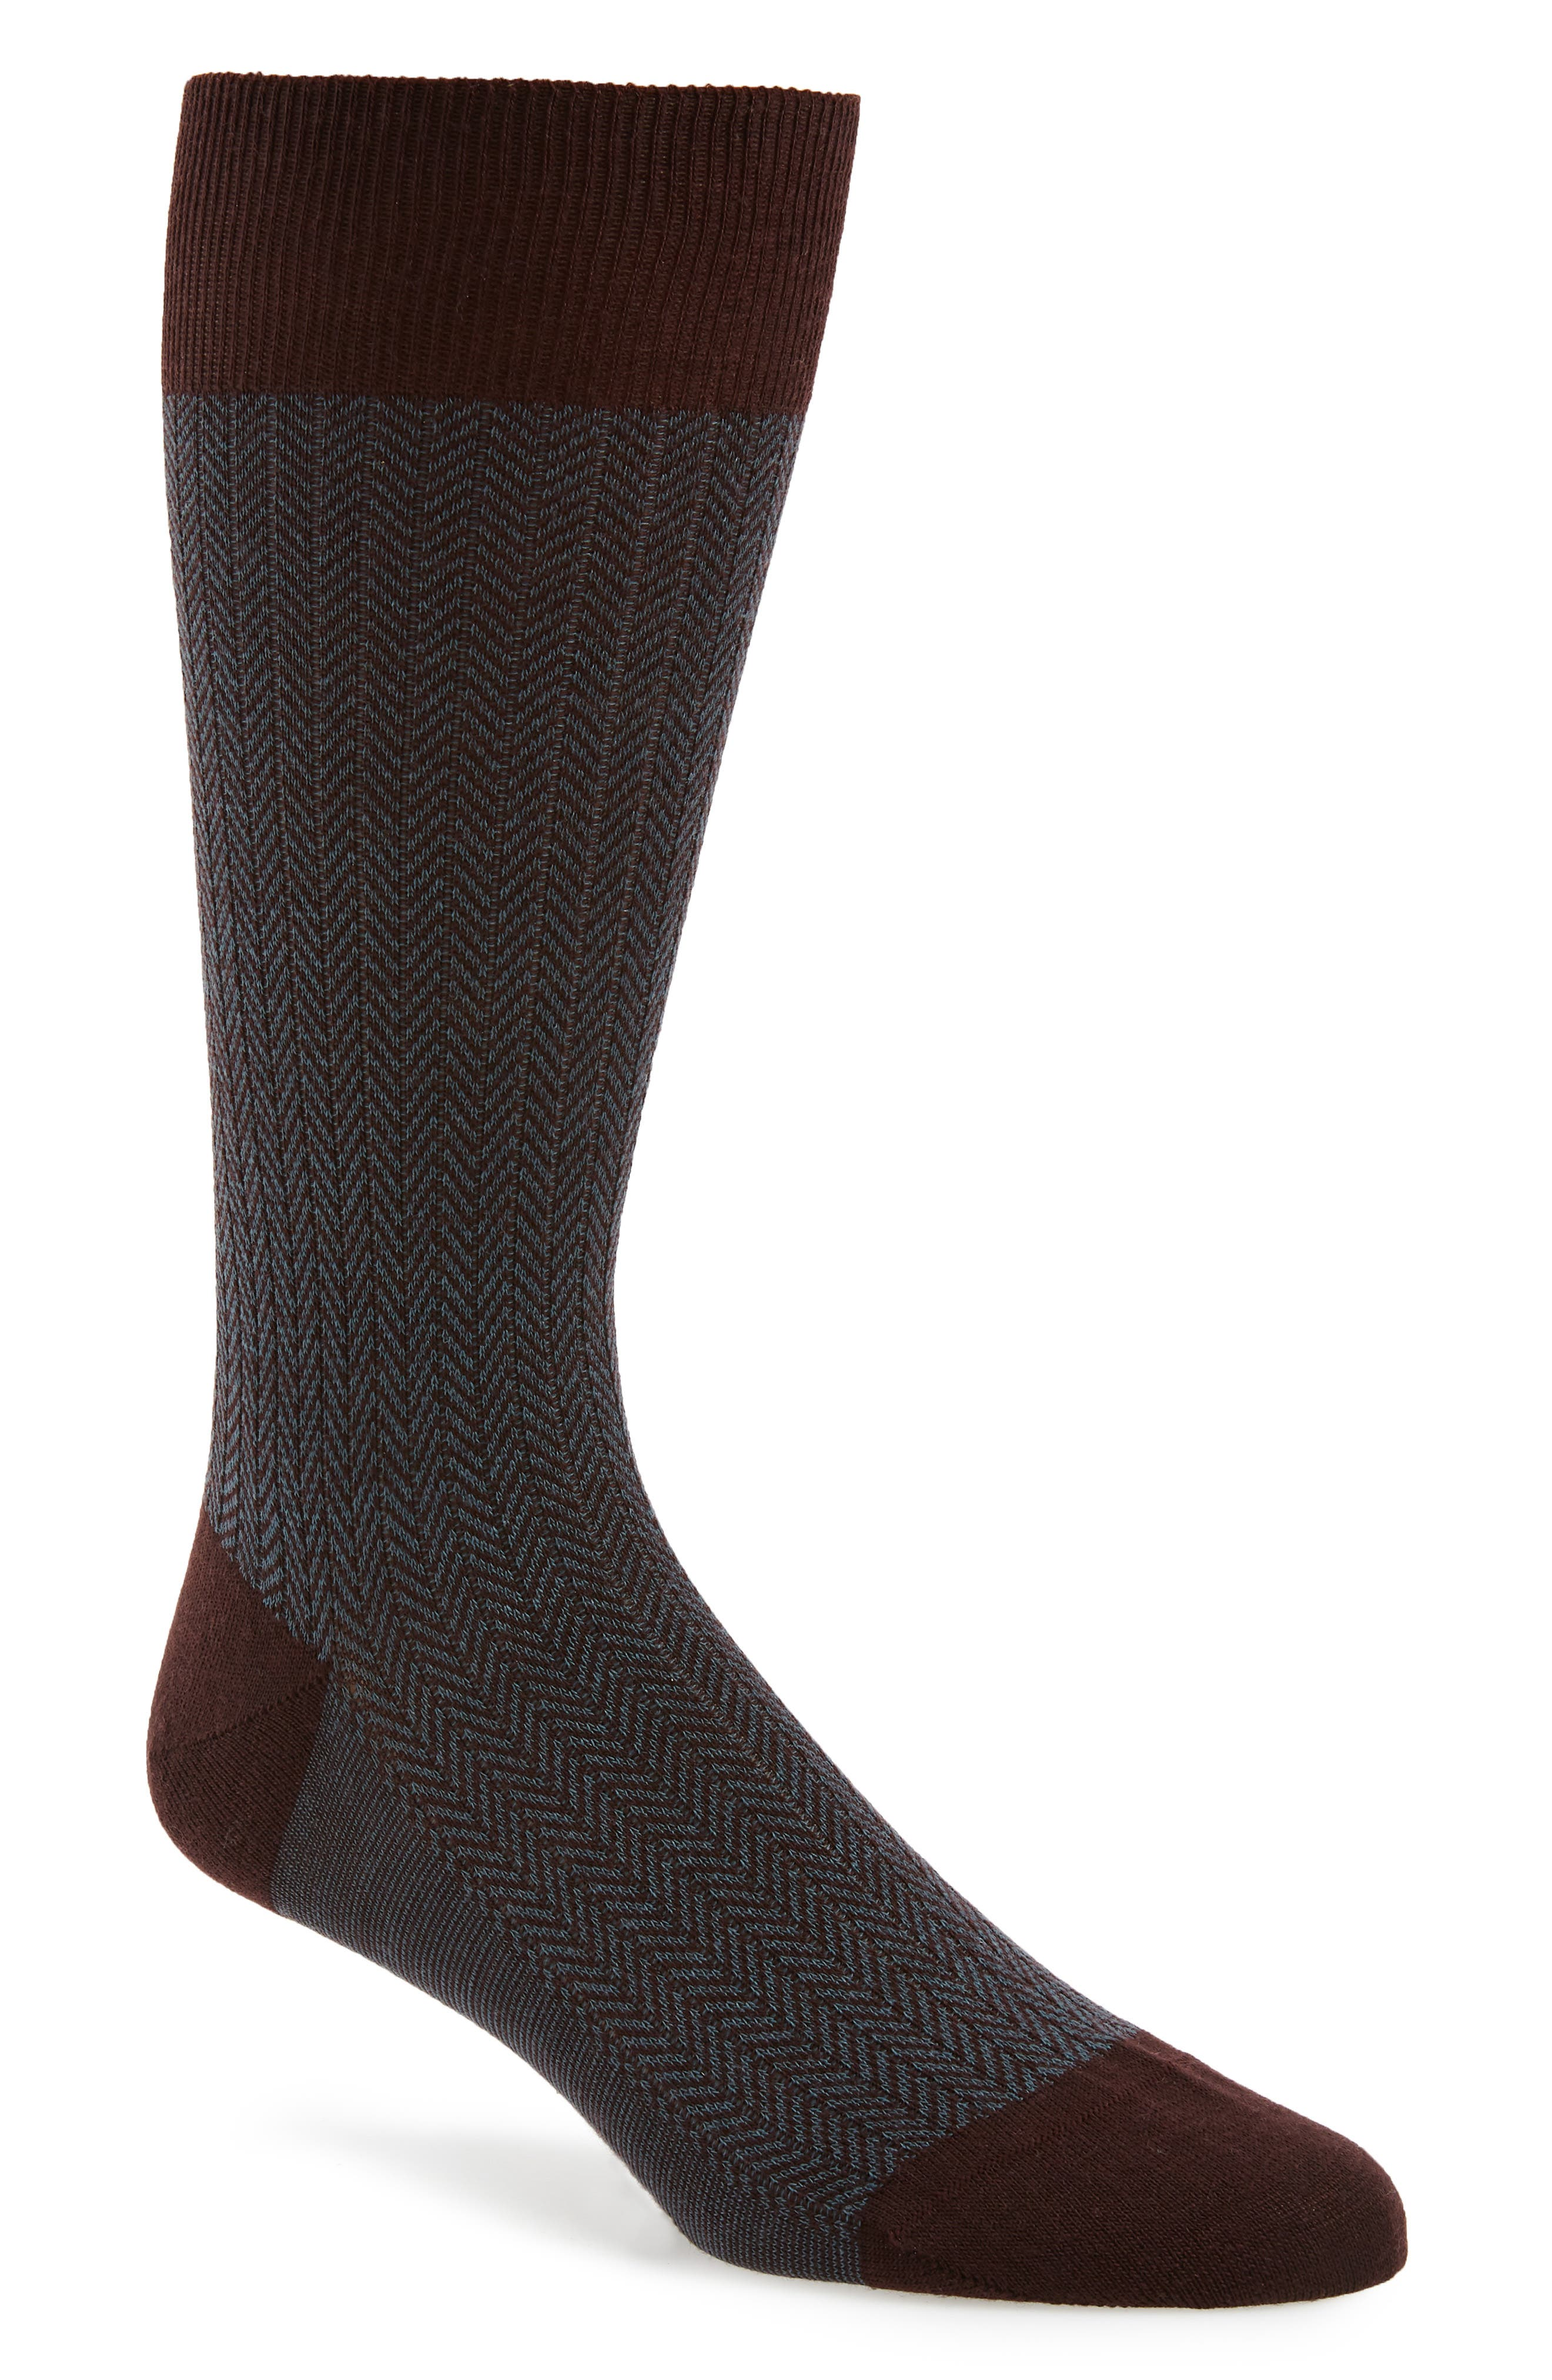 '5911' Mid-Calf Dress Socks,                         Main,                         color, MAROON 153